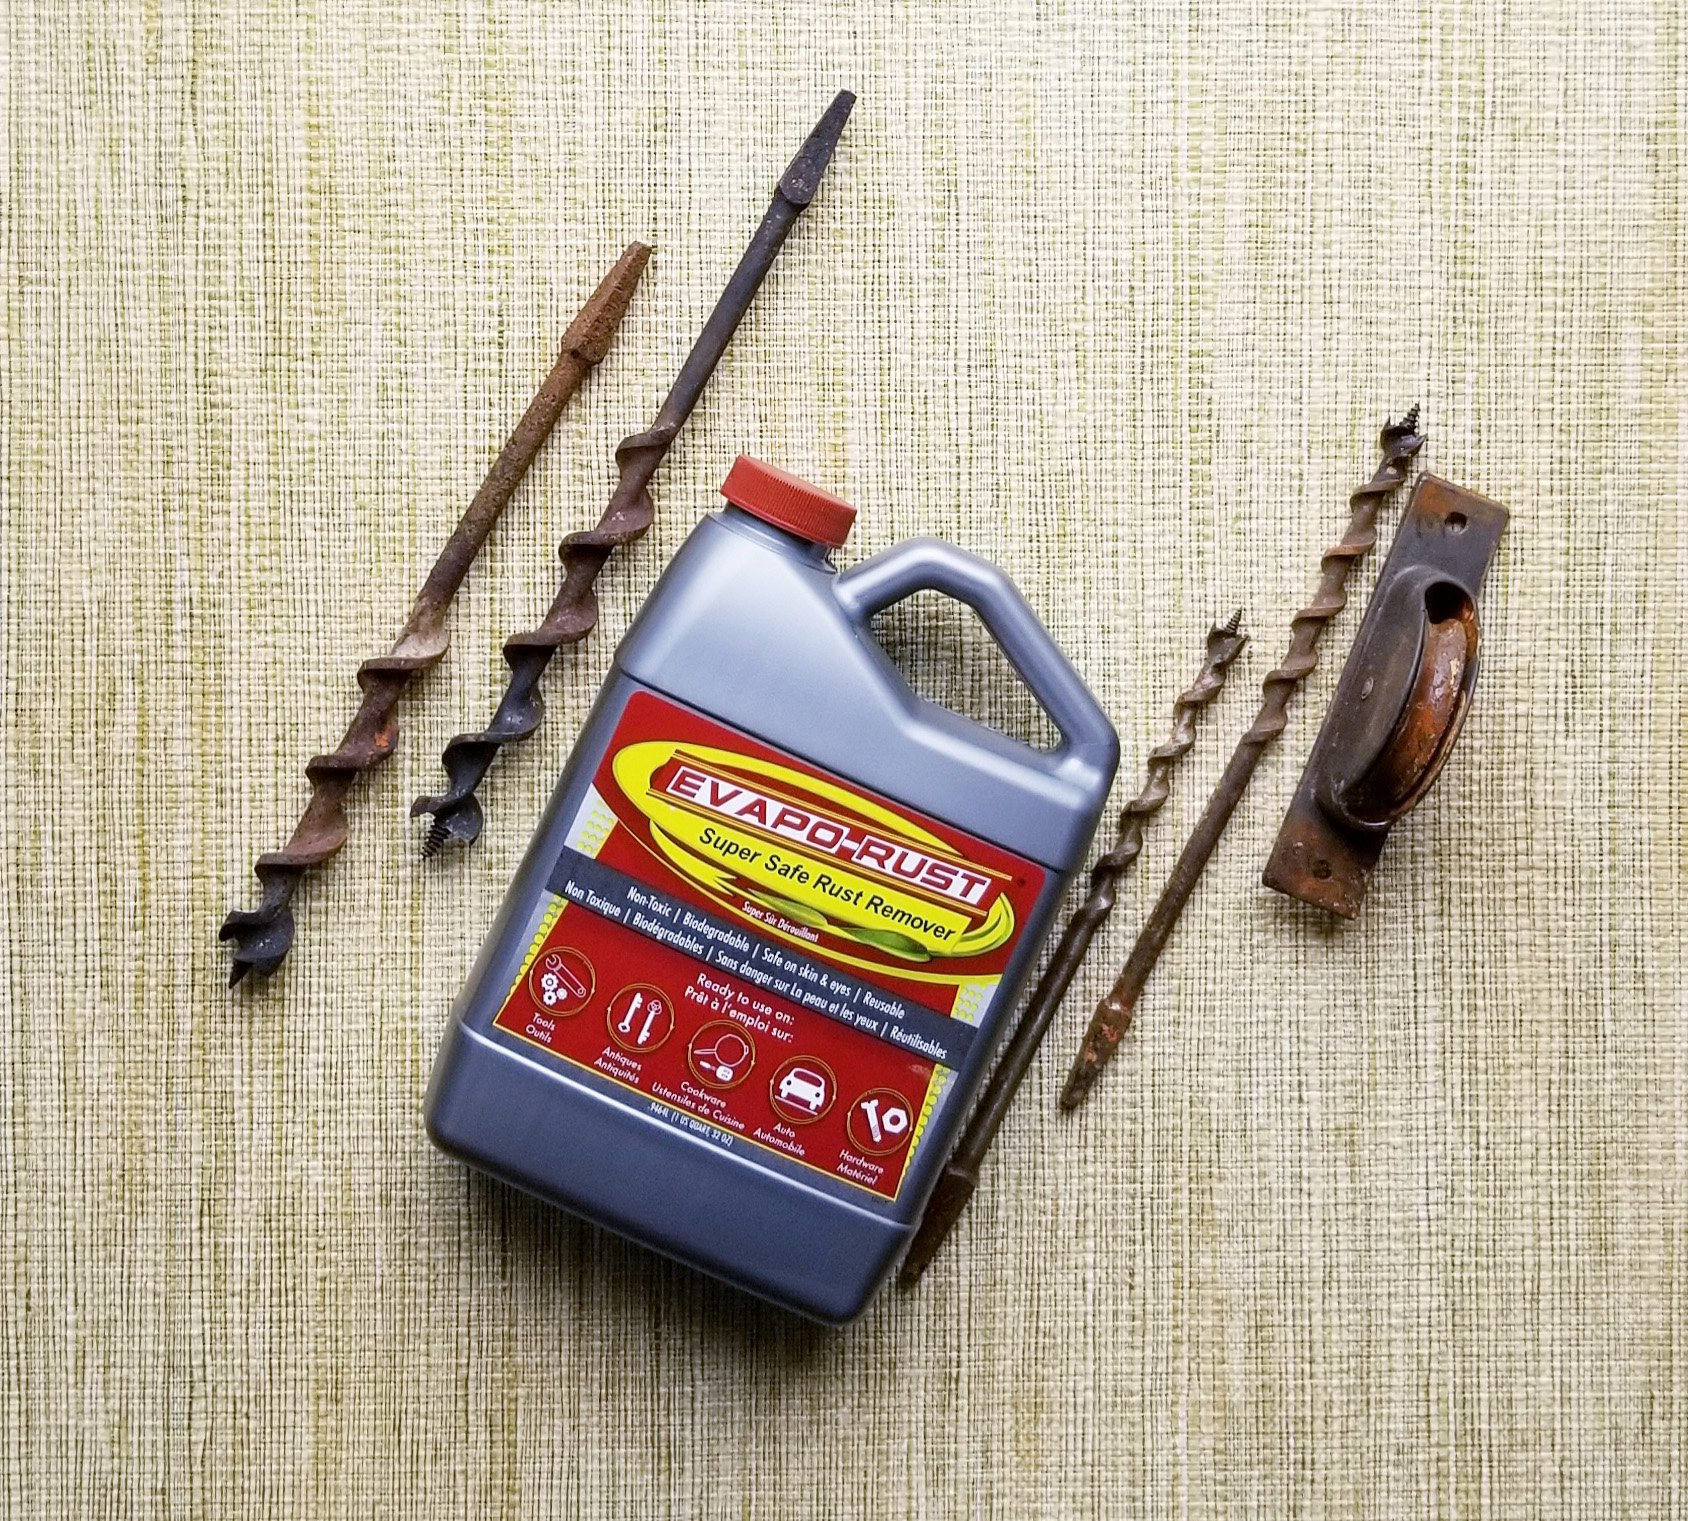 Evapo-Rust The Original Super Safe Rust Remover, Water-based, Non-Toxic, Biodegradable, 5 Gallons by Evapo-Rust (Image #4)